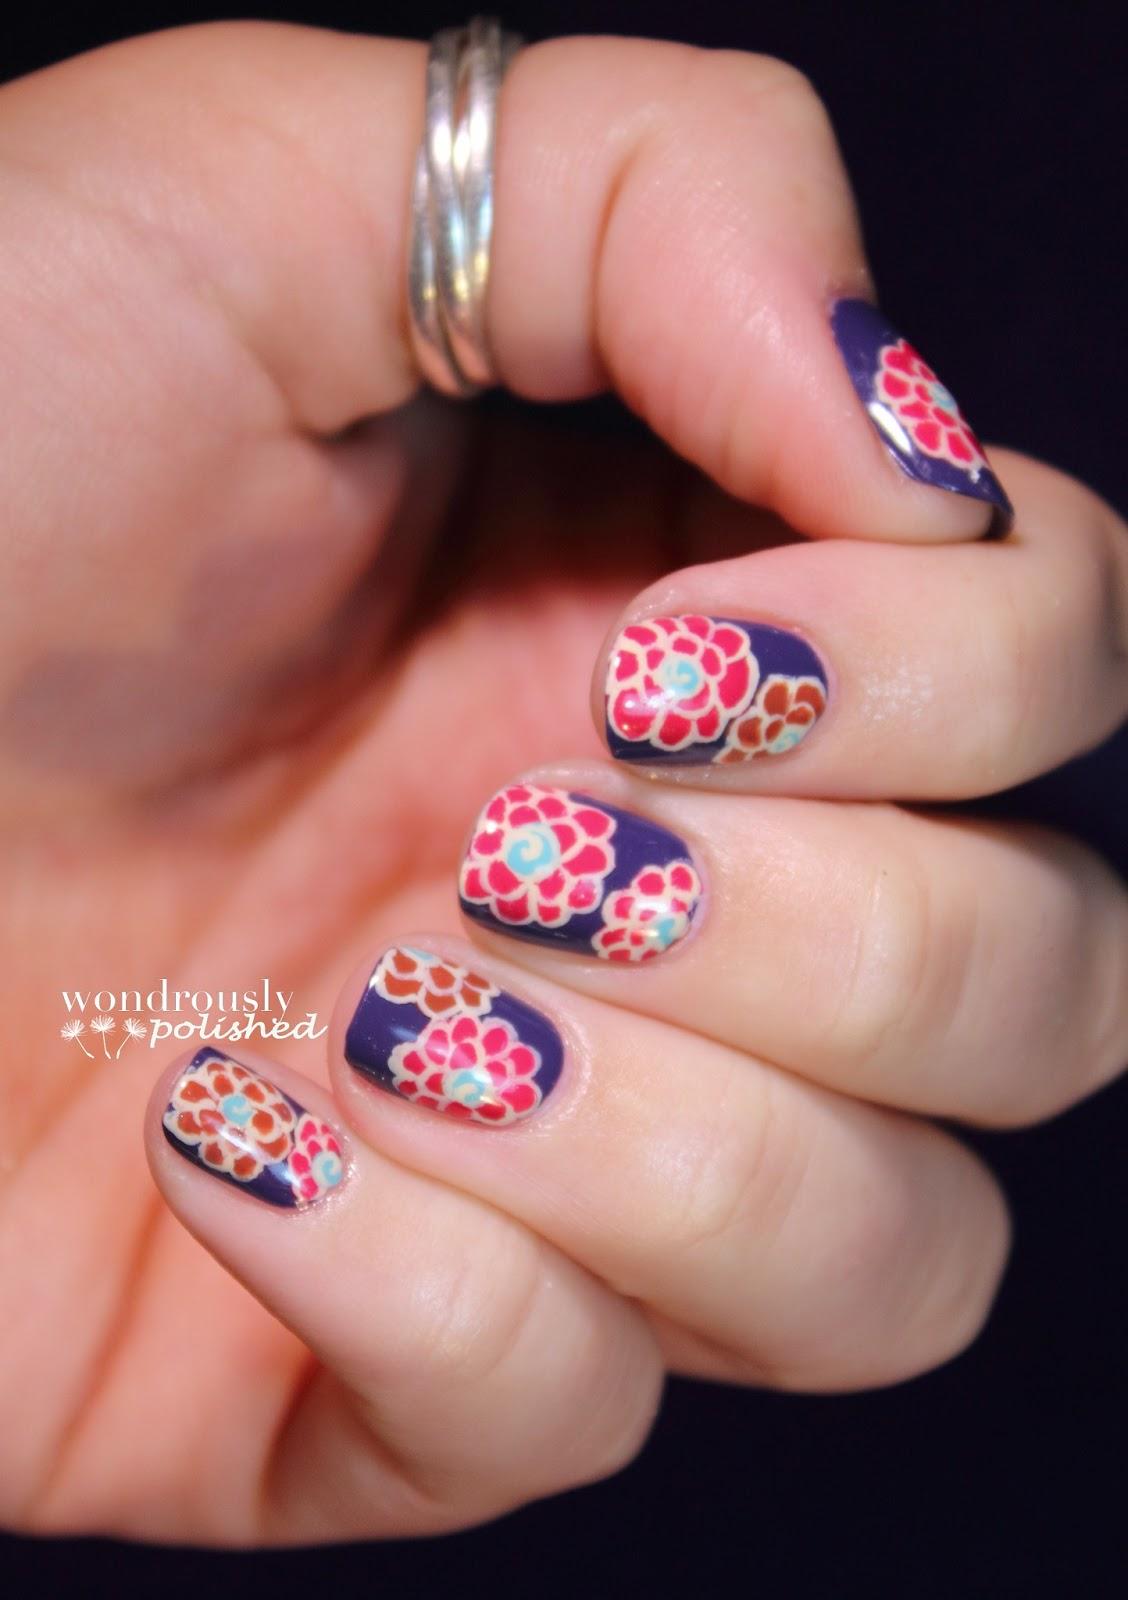 Wondrously Polished April Nail Art Challenge: Wondrously Polished: A Green Thumb Equivalent